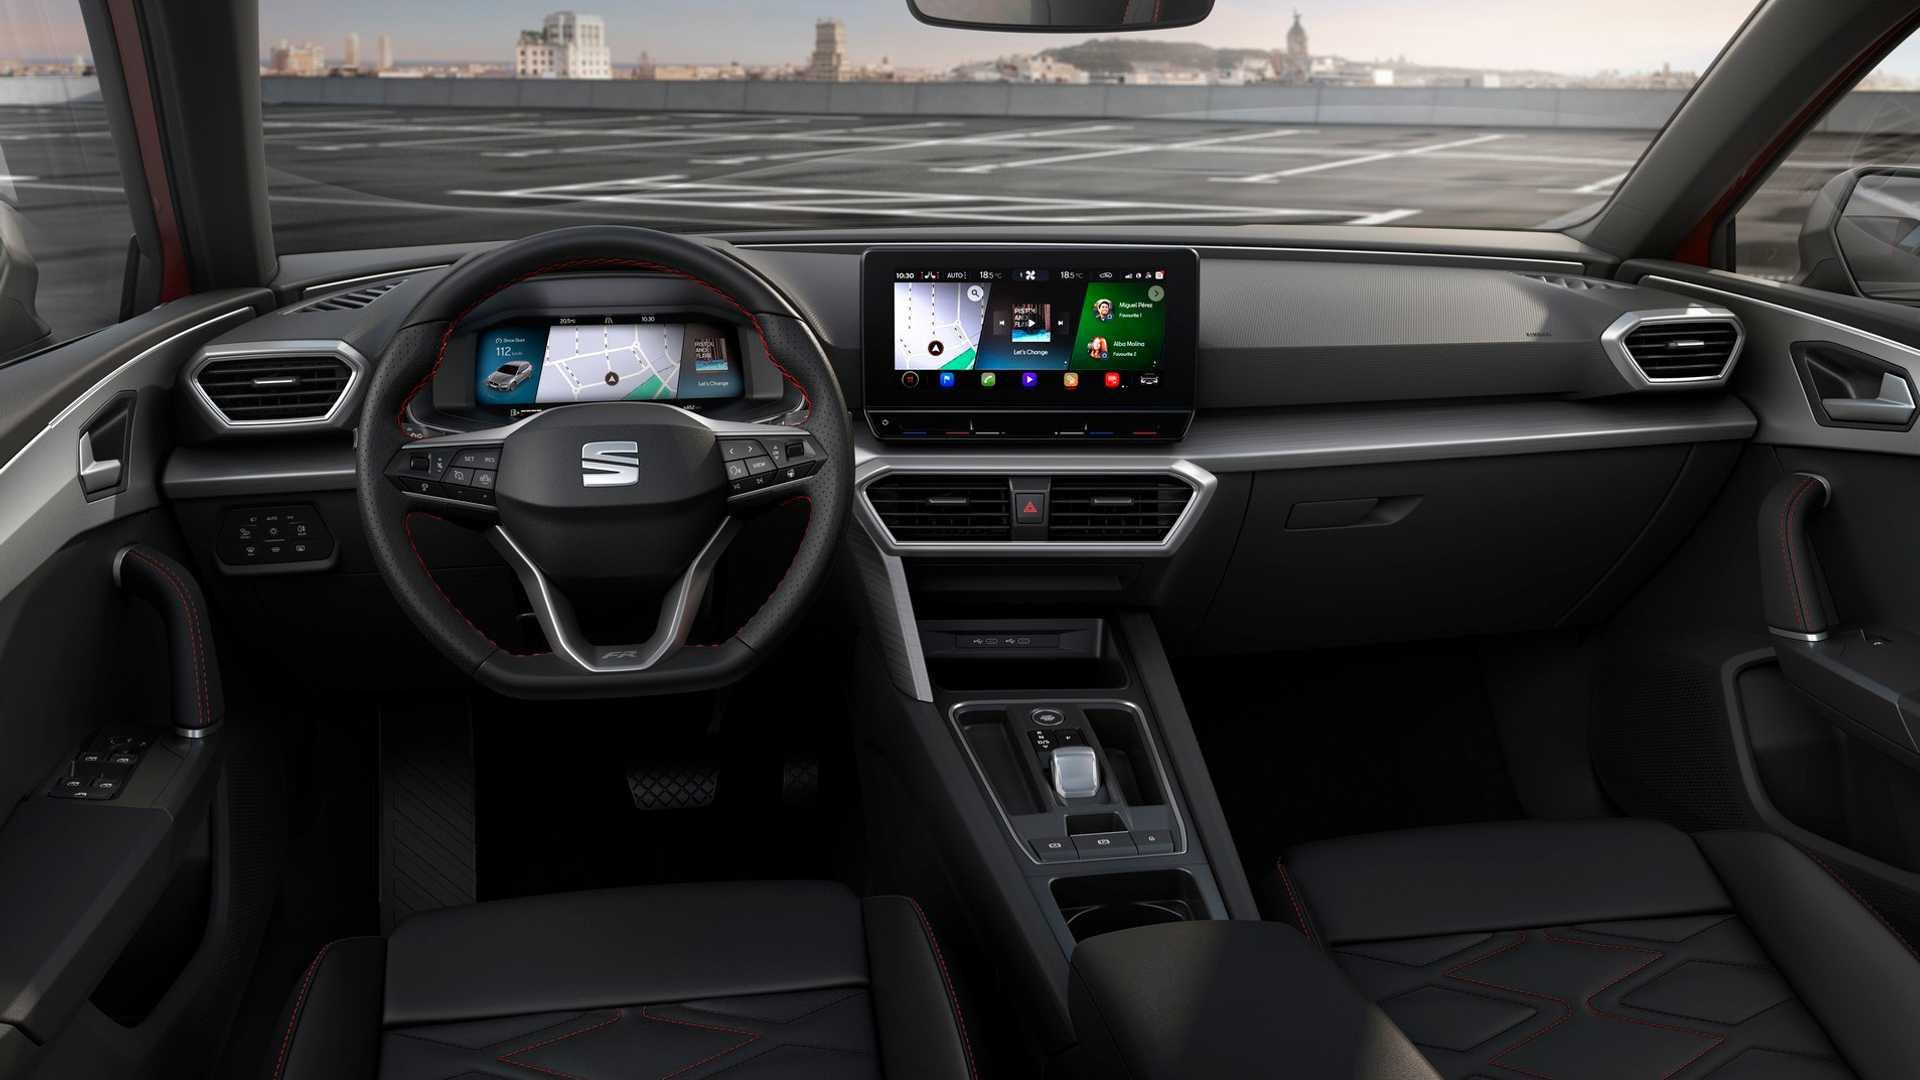 seat-leon-2020 (3).jpg